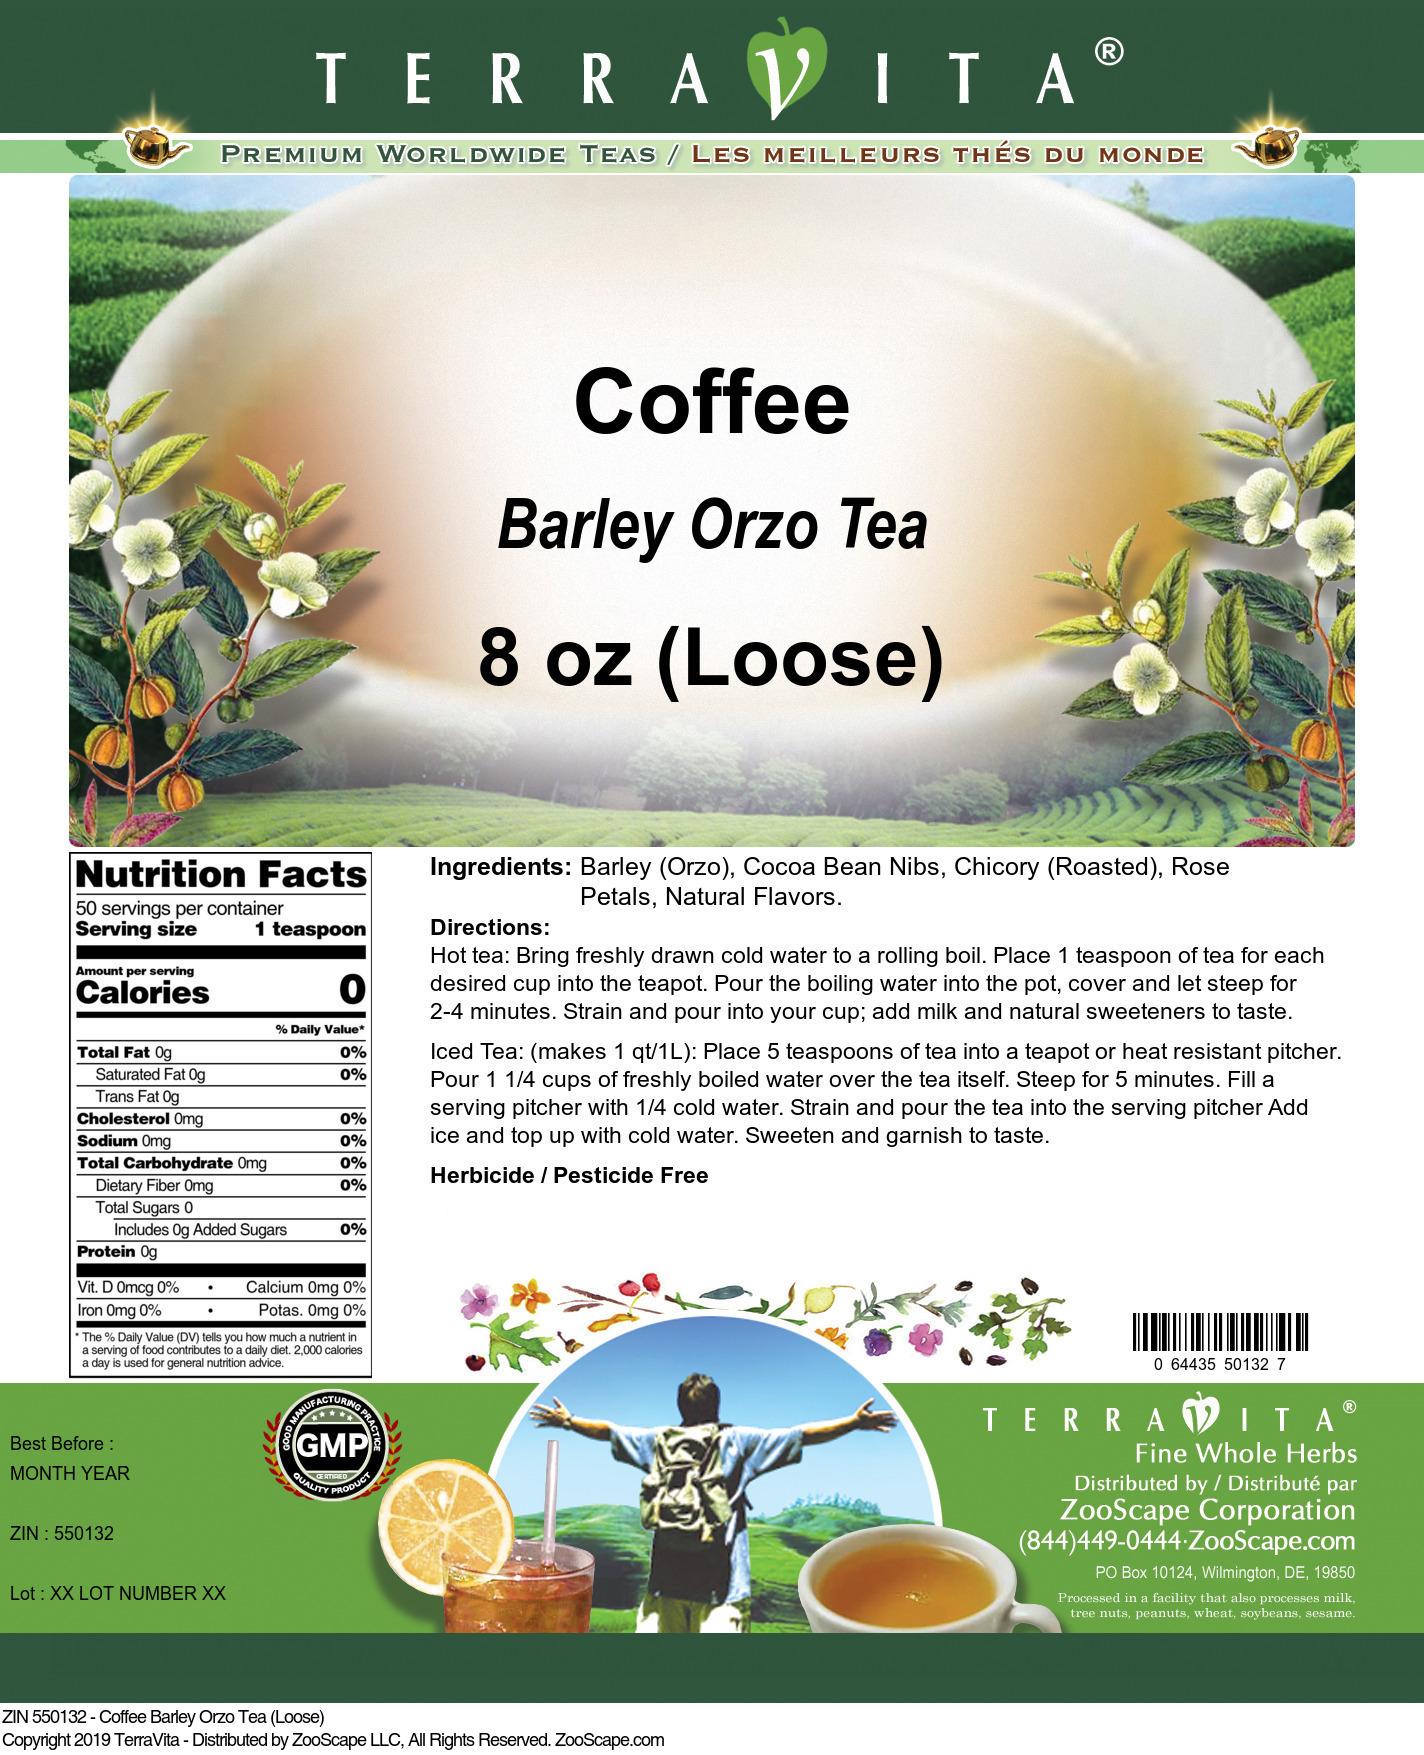 Coffee Barley Orzo Tea (Loose)